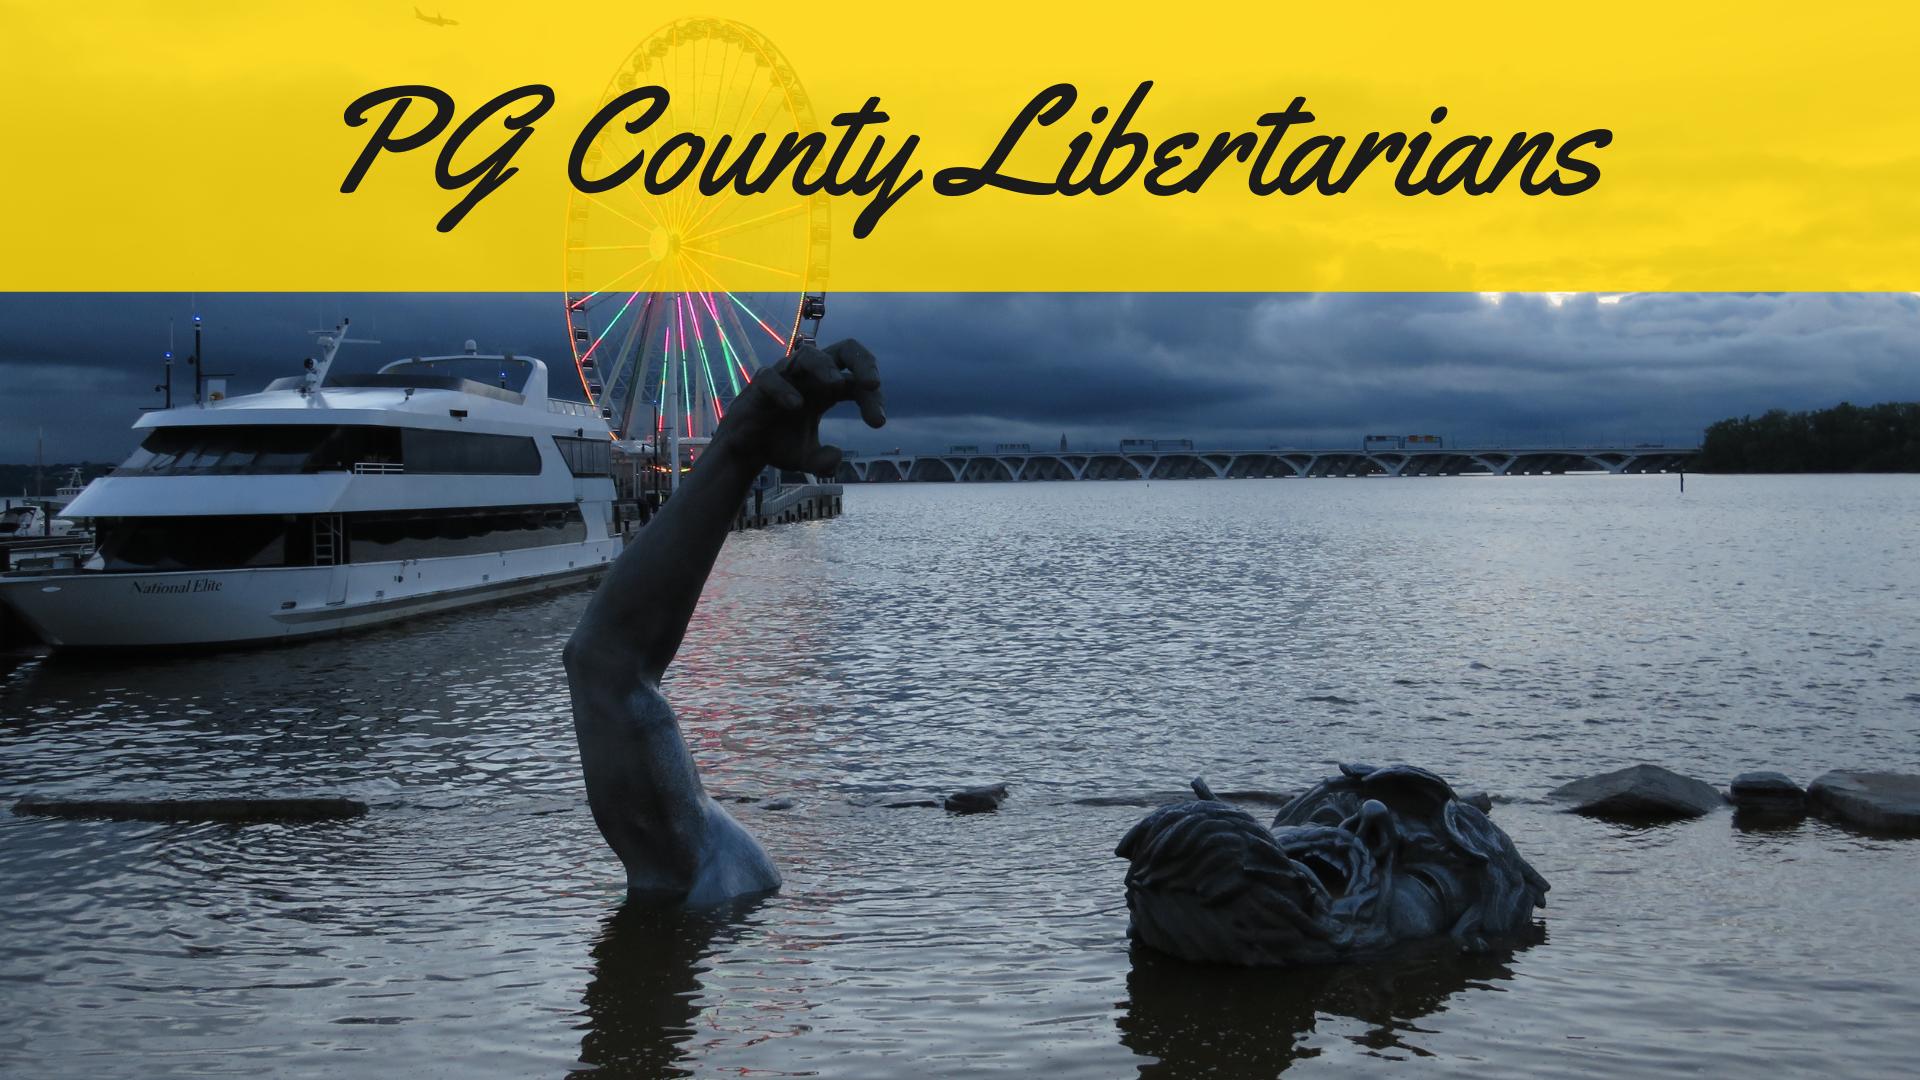 PG County Libertarians Awakening!